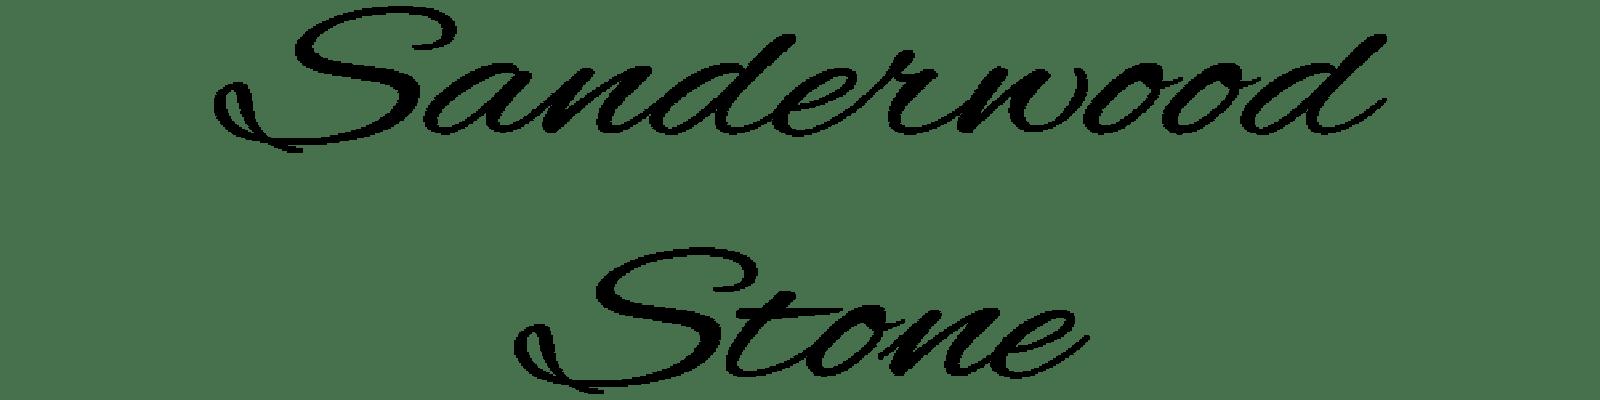 Sanderwood Stone